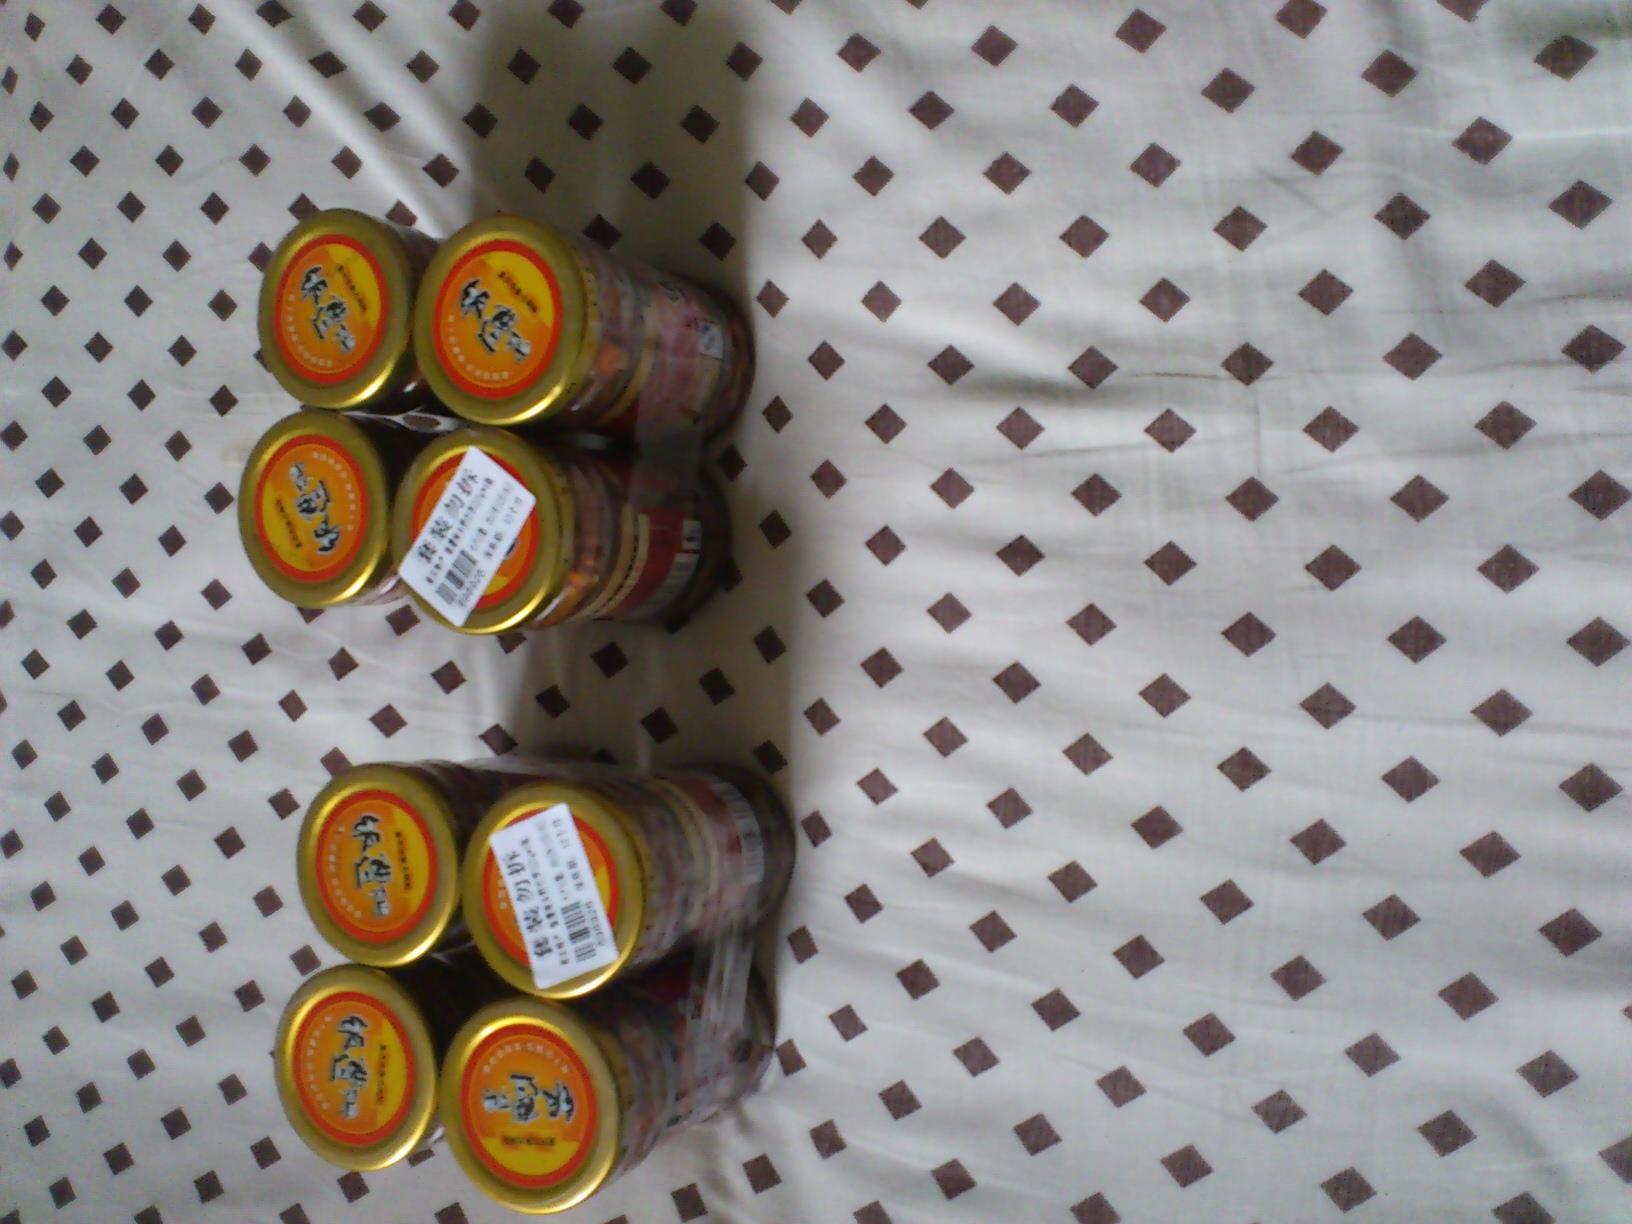 serratelli hats 00256748 wholesale